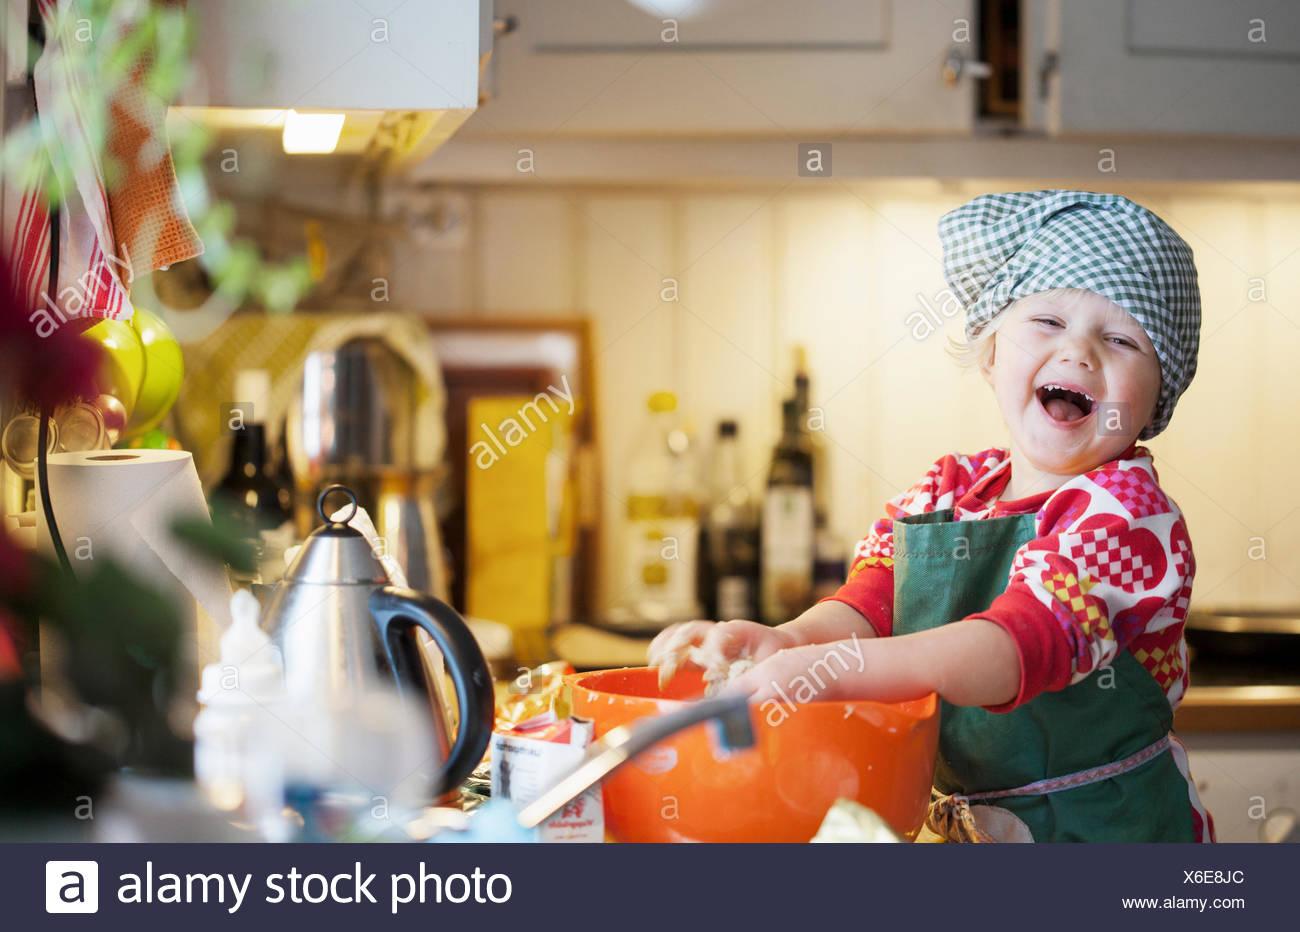 Un felice ragazza di cottura in una cucina Immagini Stock